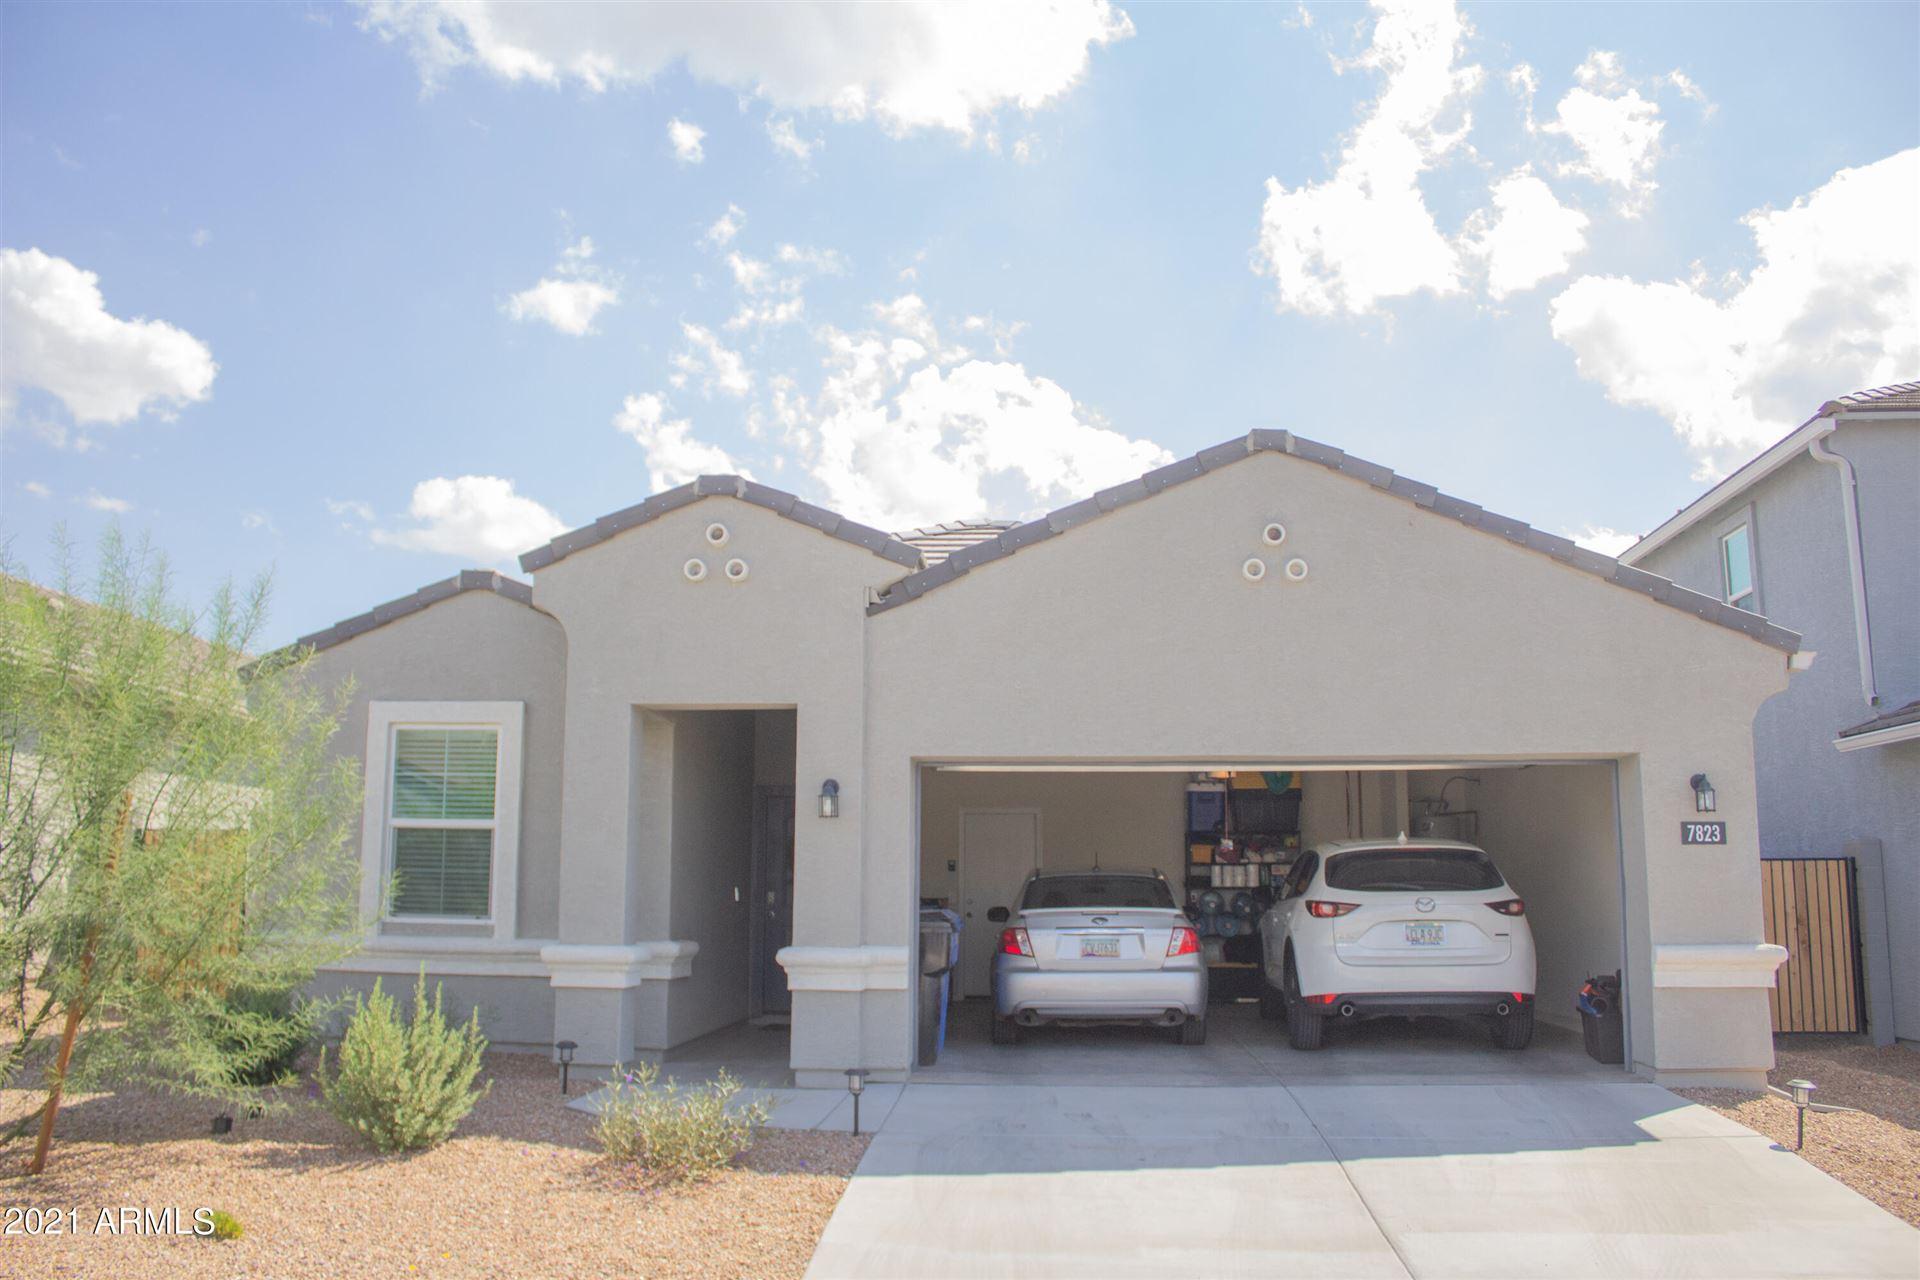 7823 W GLOBE Avenue, Phoenix, AZ 85043 - MLS#: 6296612